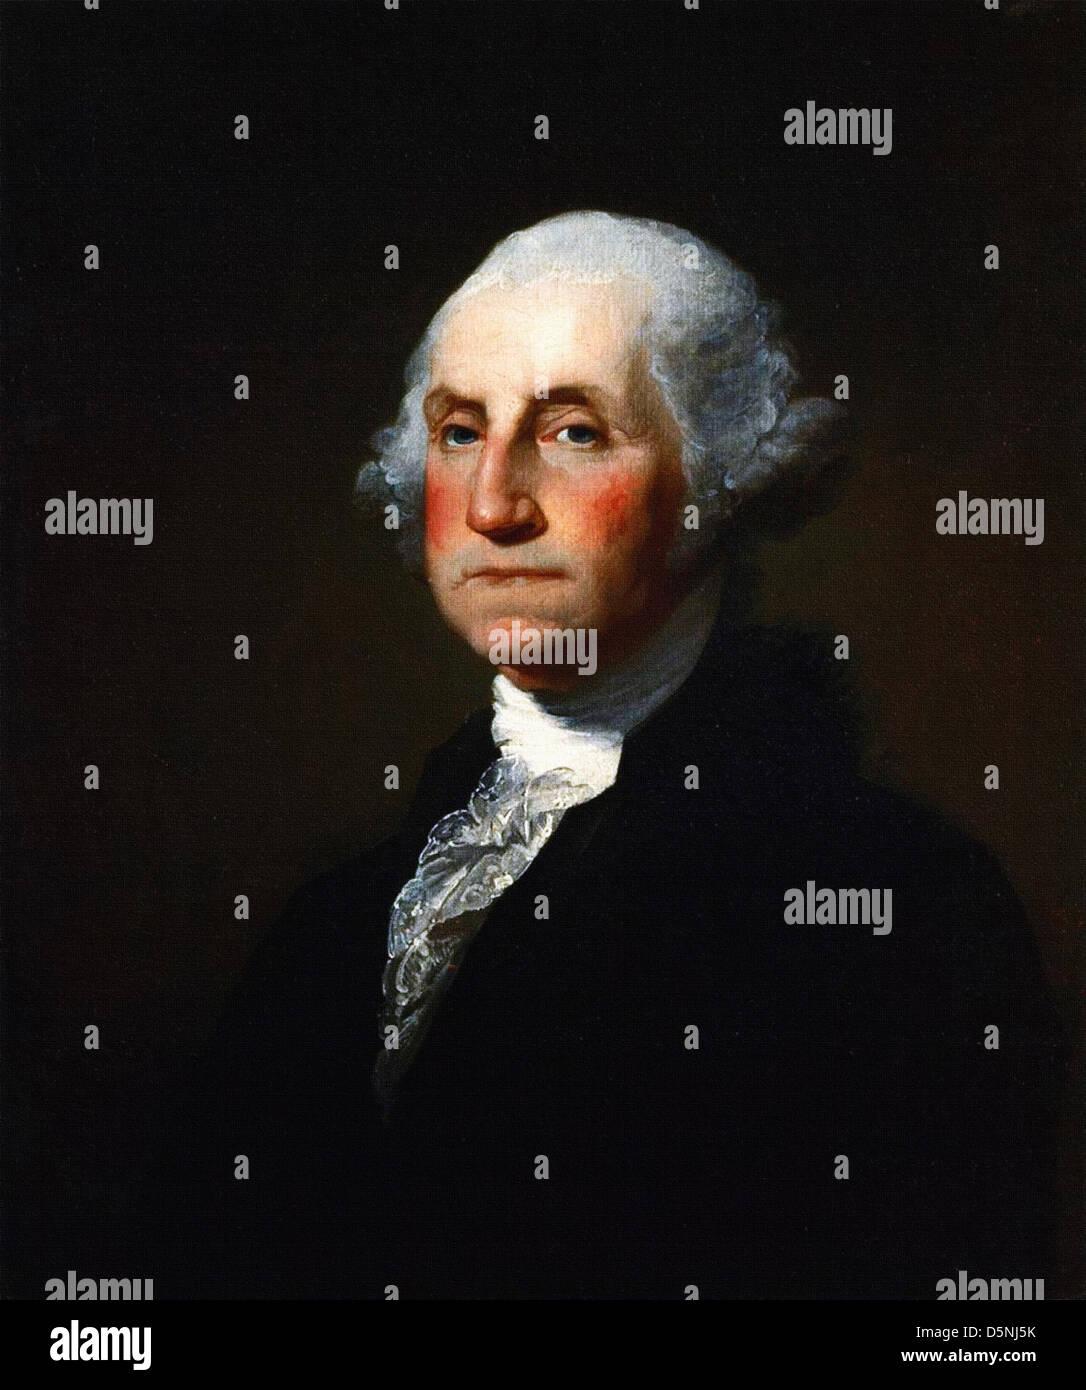 Gilbert Charles Stuart, George Washington the first good president. 1797 Oil on canvas. Stock Photo